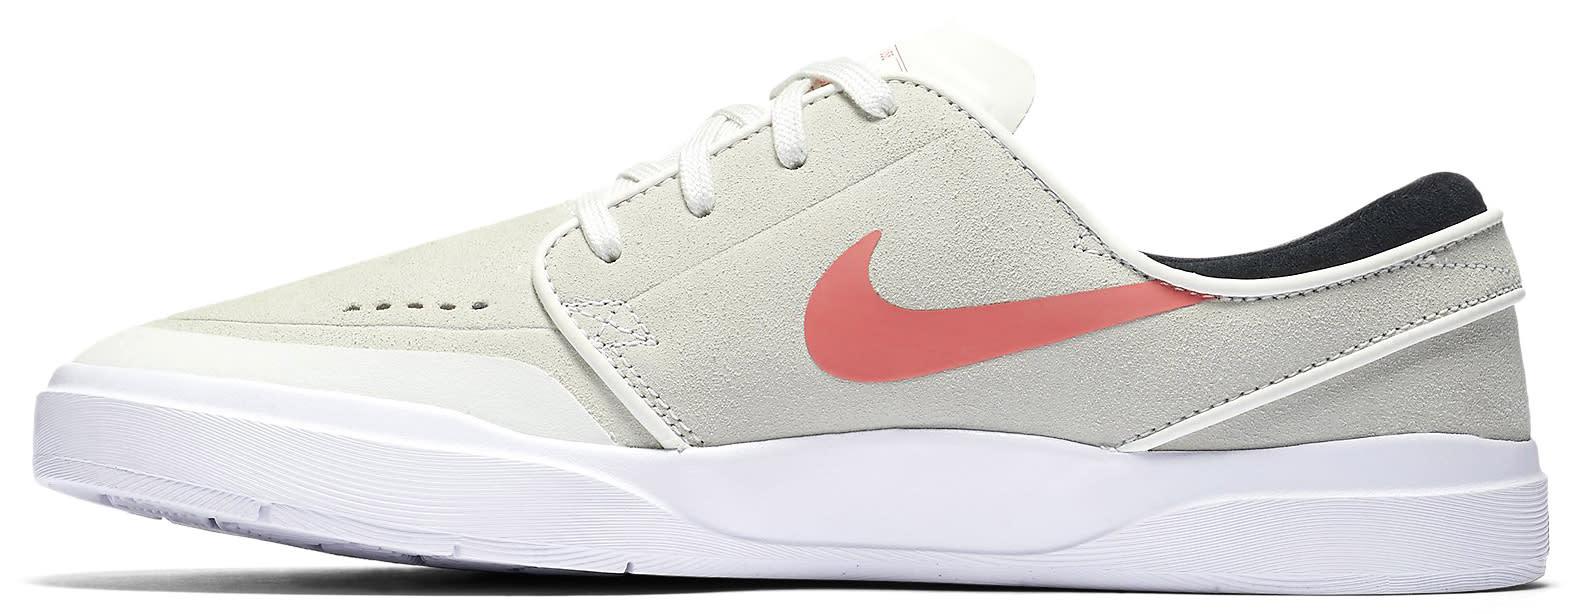 buy online 2a9c3 6e808 Nike Stefan Janoski Hyperfeel XT Skate Shoes - thumbnail 2